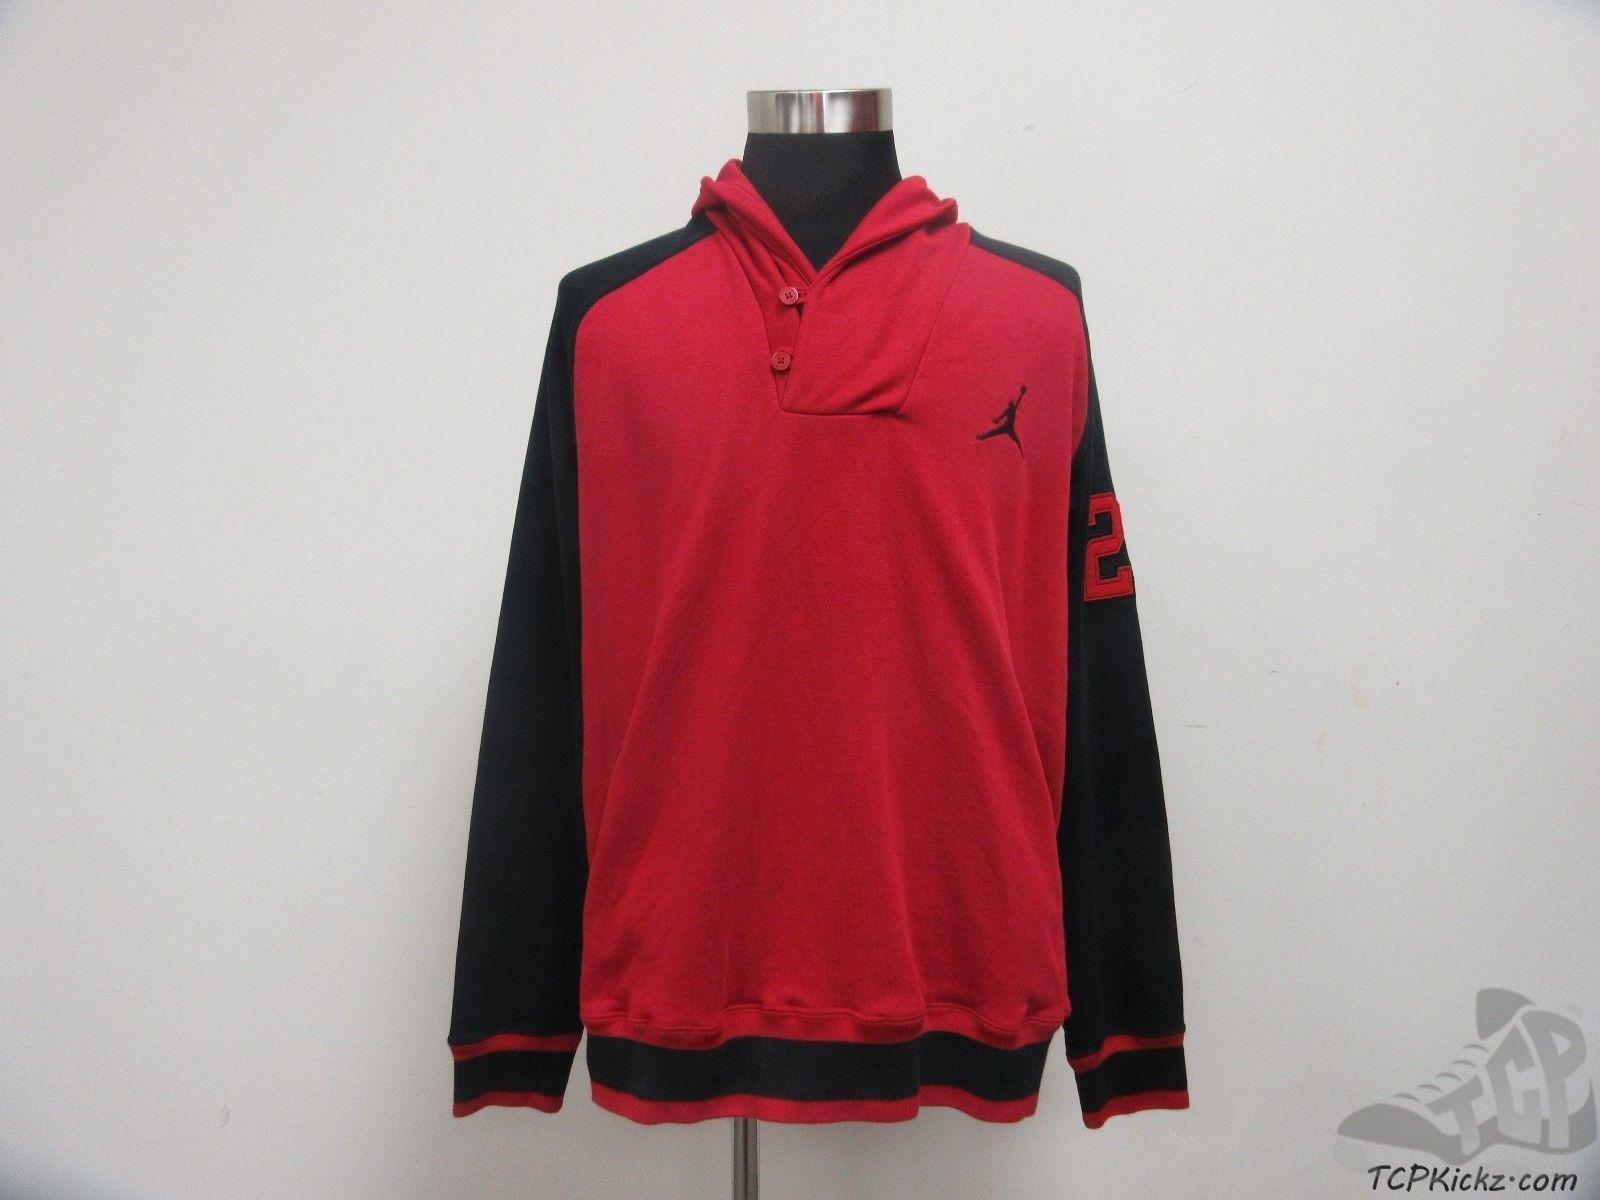 989ed166ee9 Men apparel air jordan jumpman red shawl jordan mens fashion jpg 1600x1200 Jordan  shawl